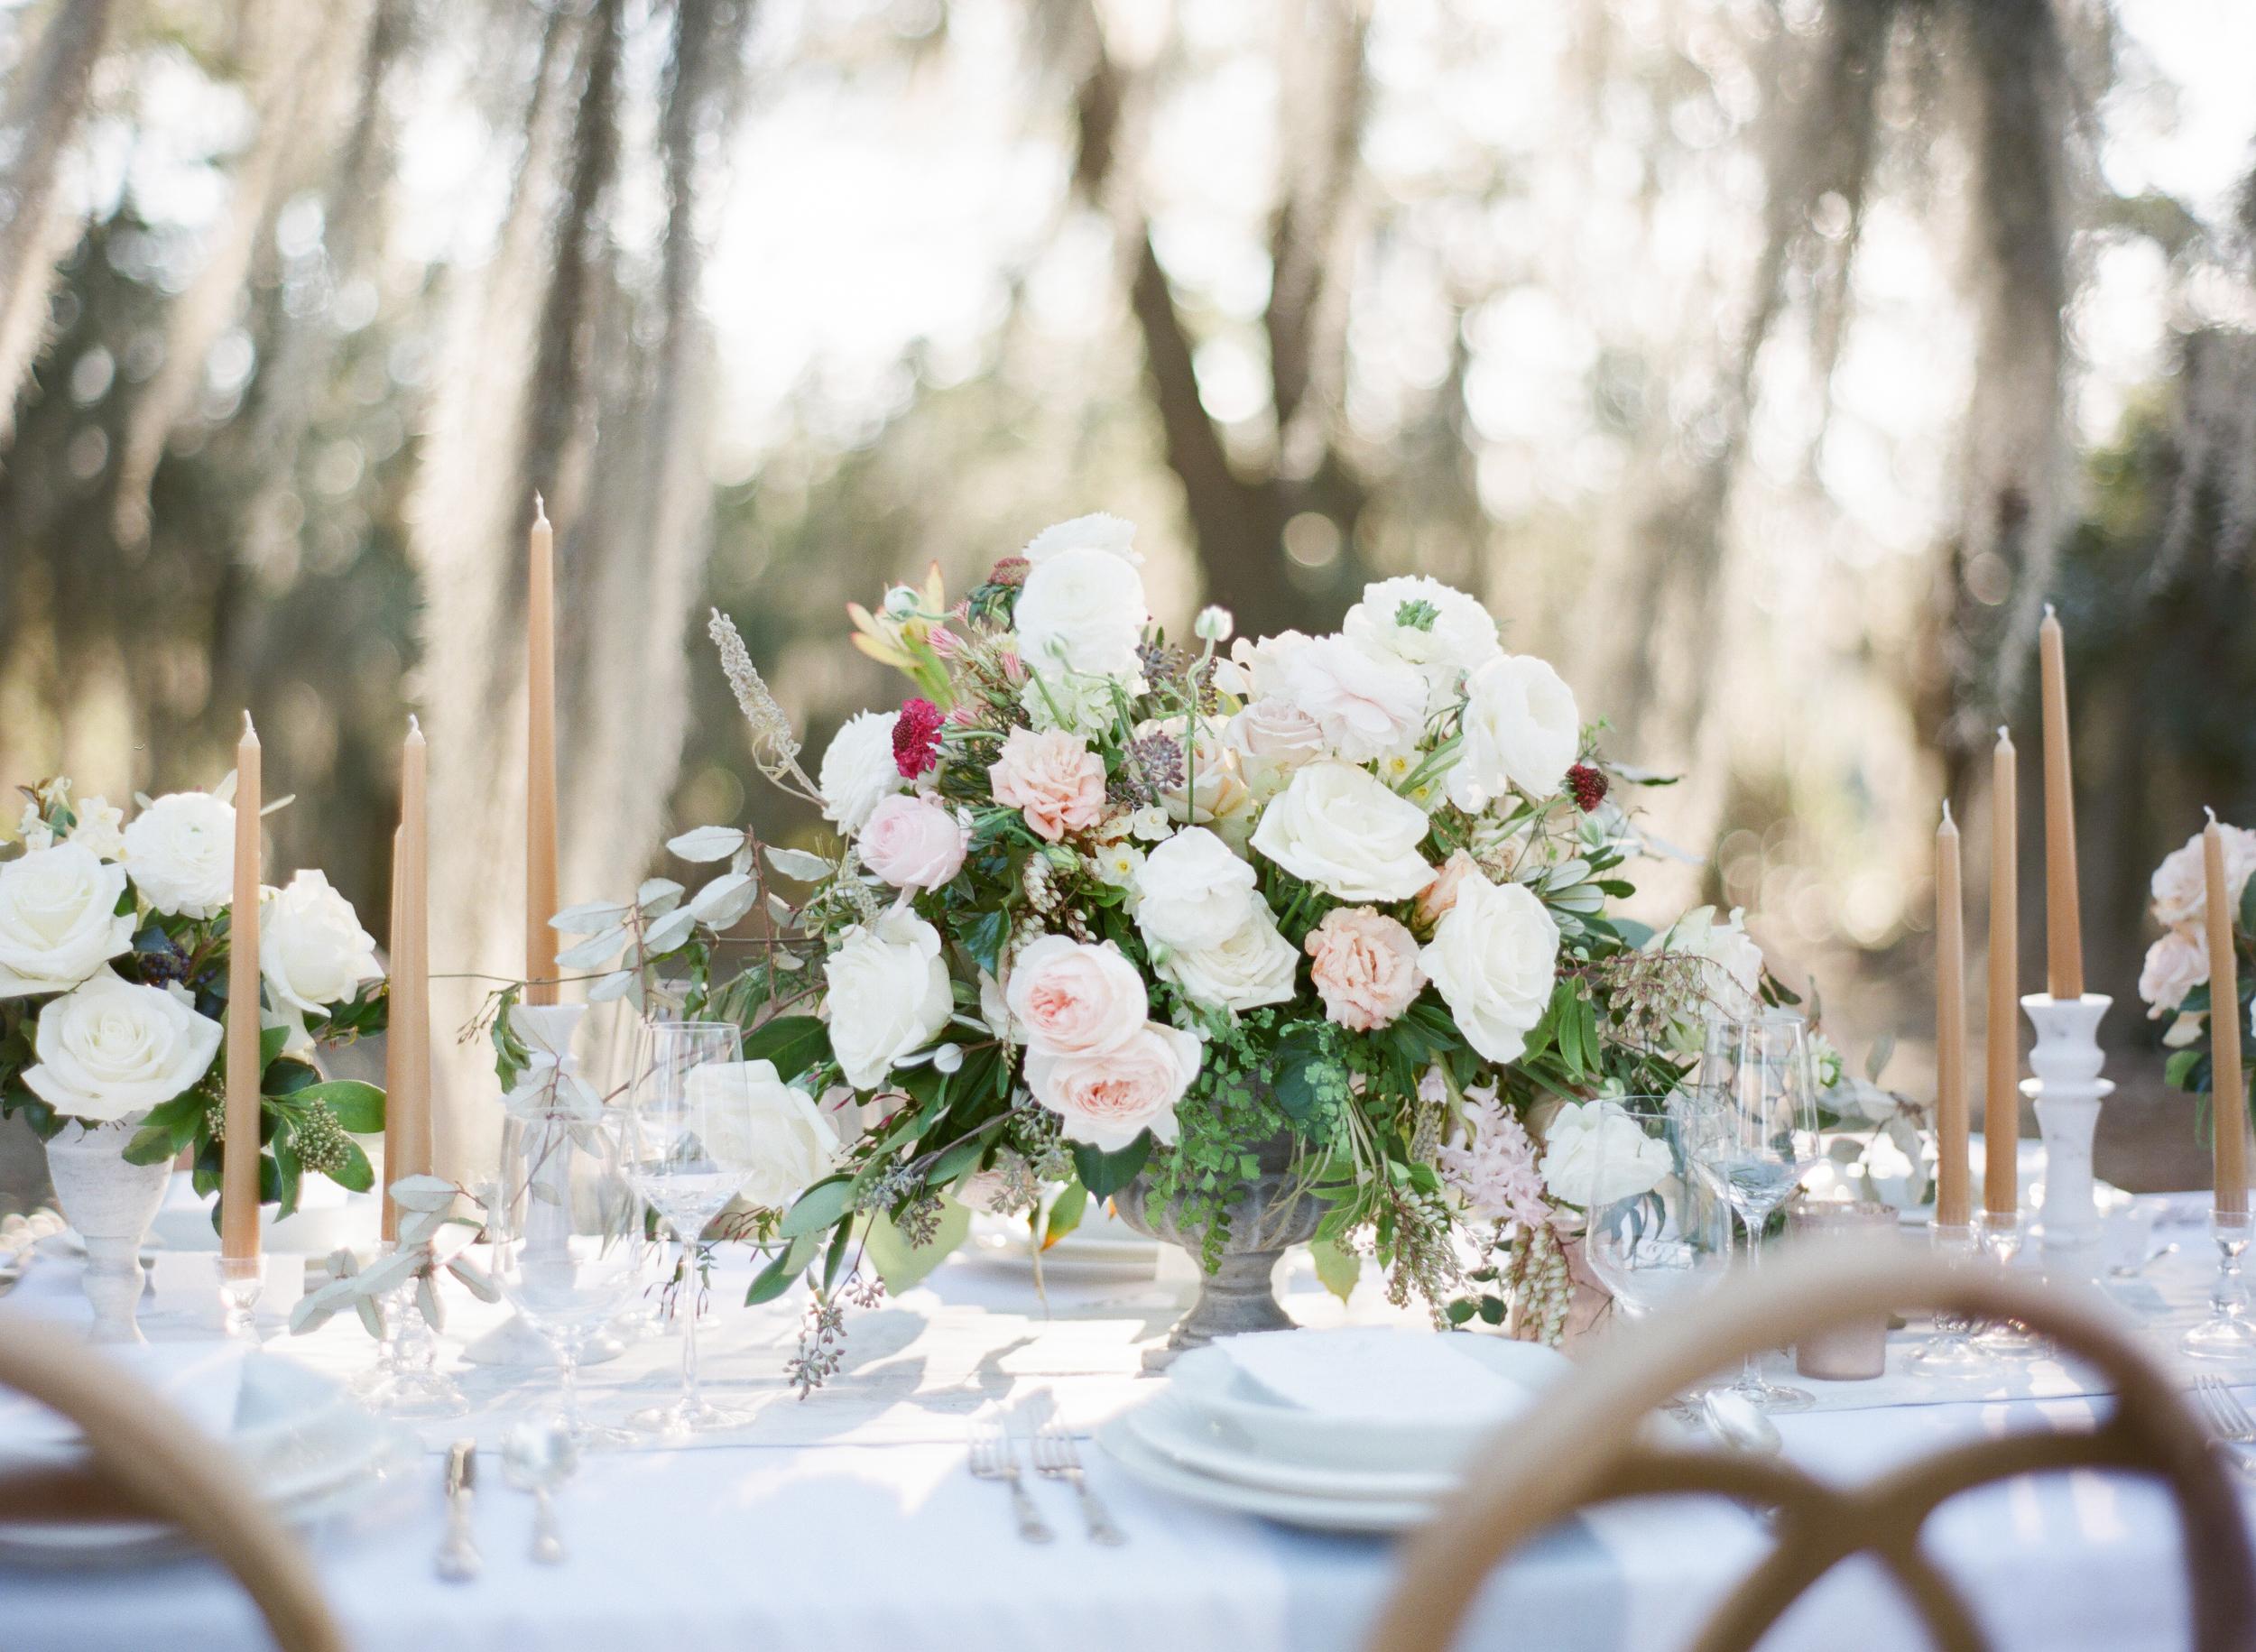 Amherst MA Tented Backyard Weddings